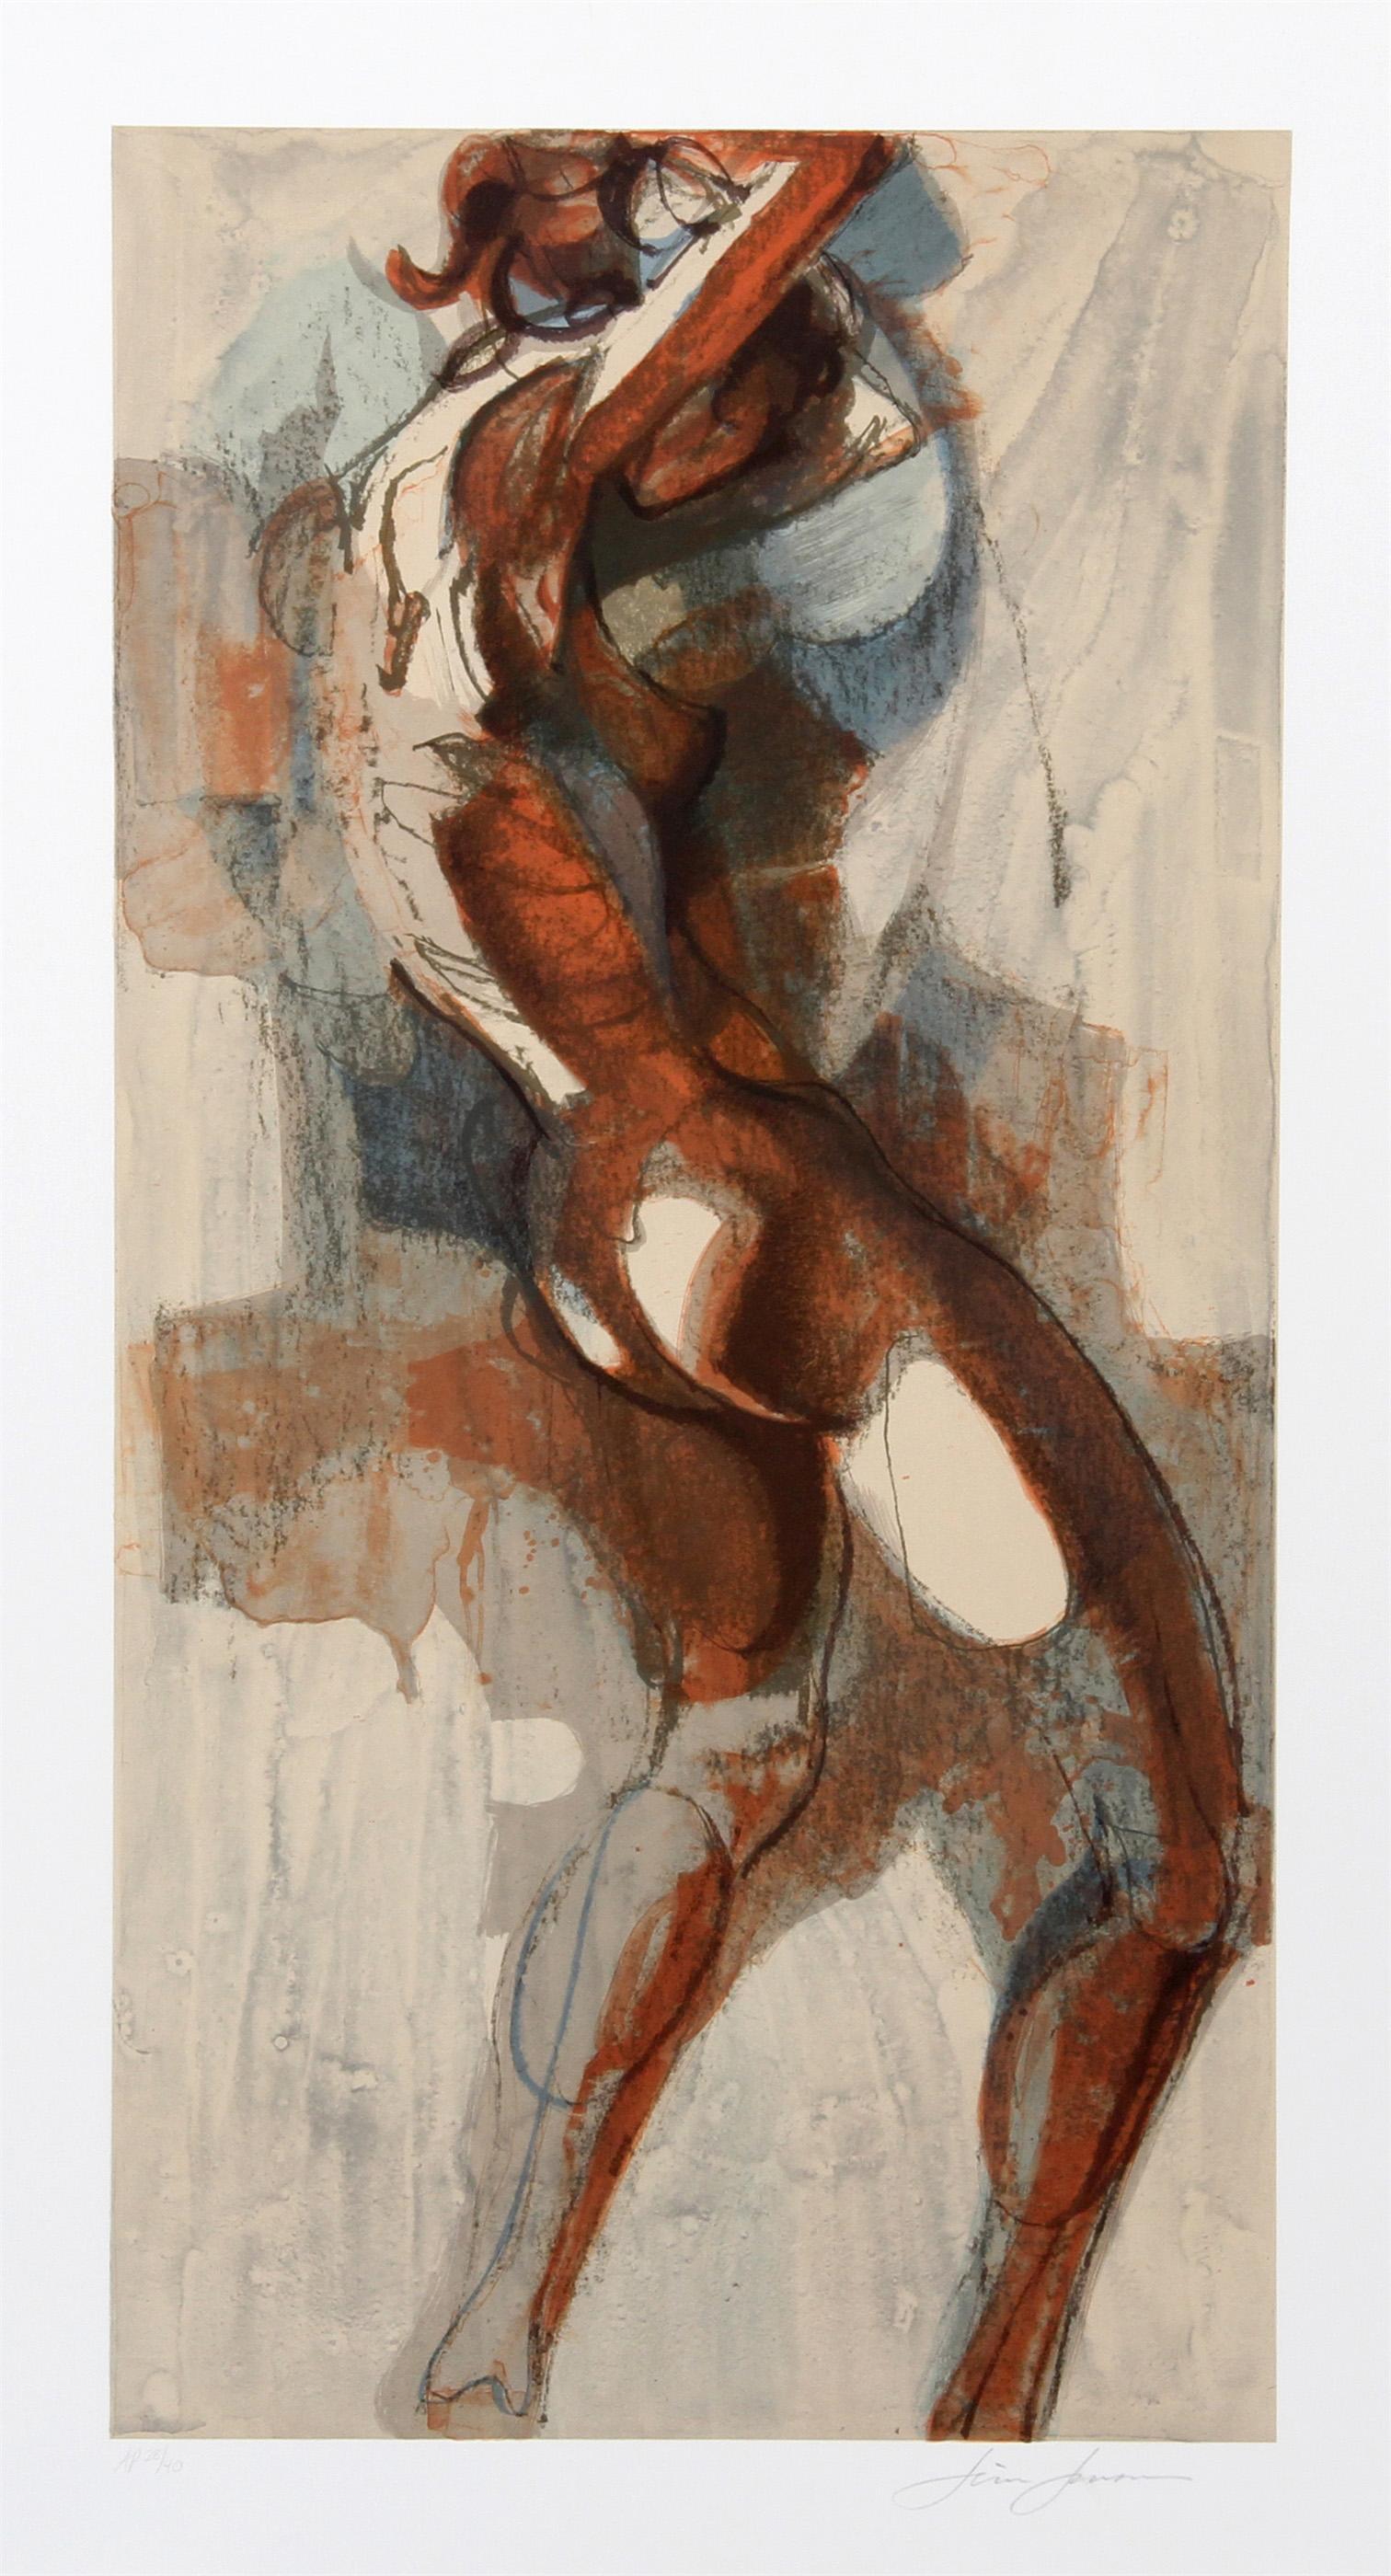 Jim Jonson, Dancer III, Lithograph